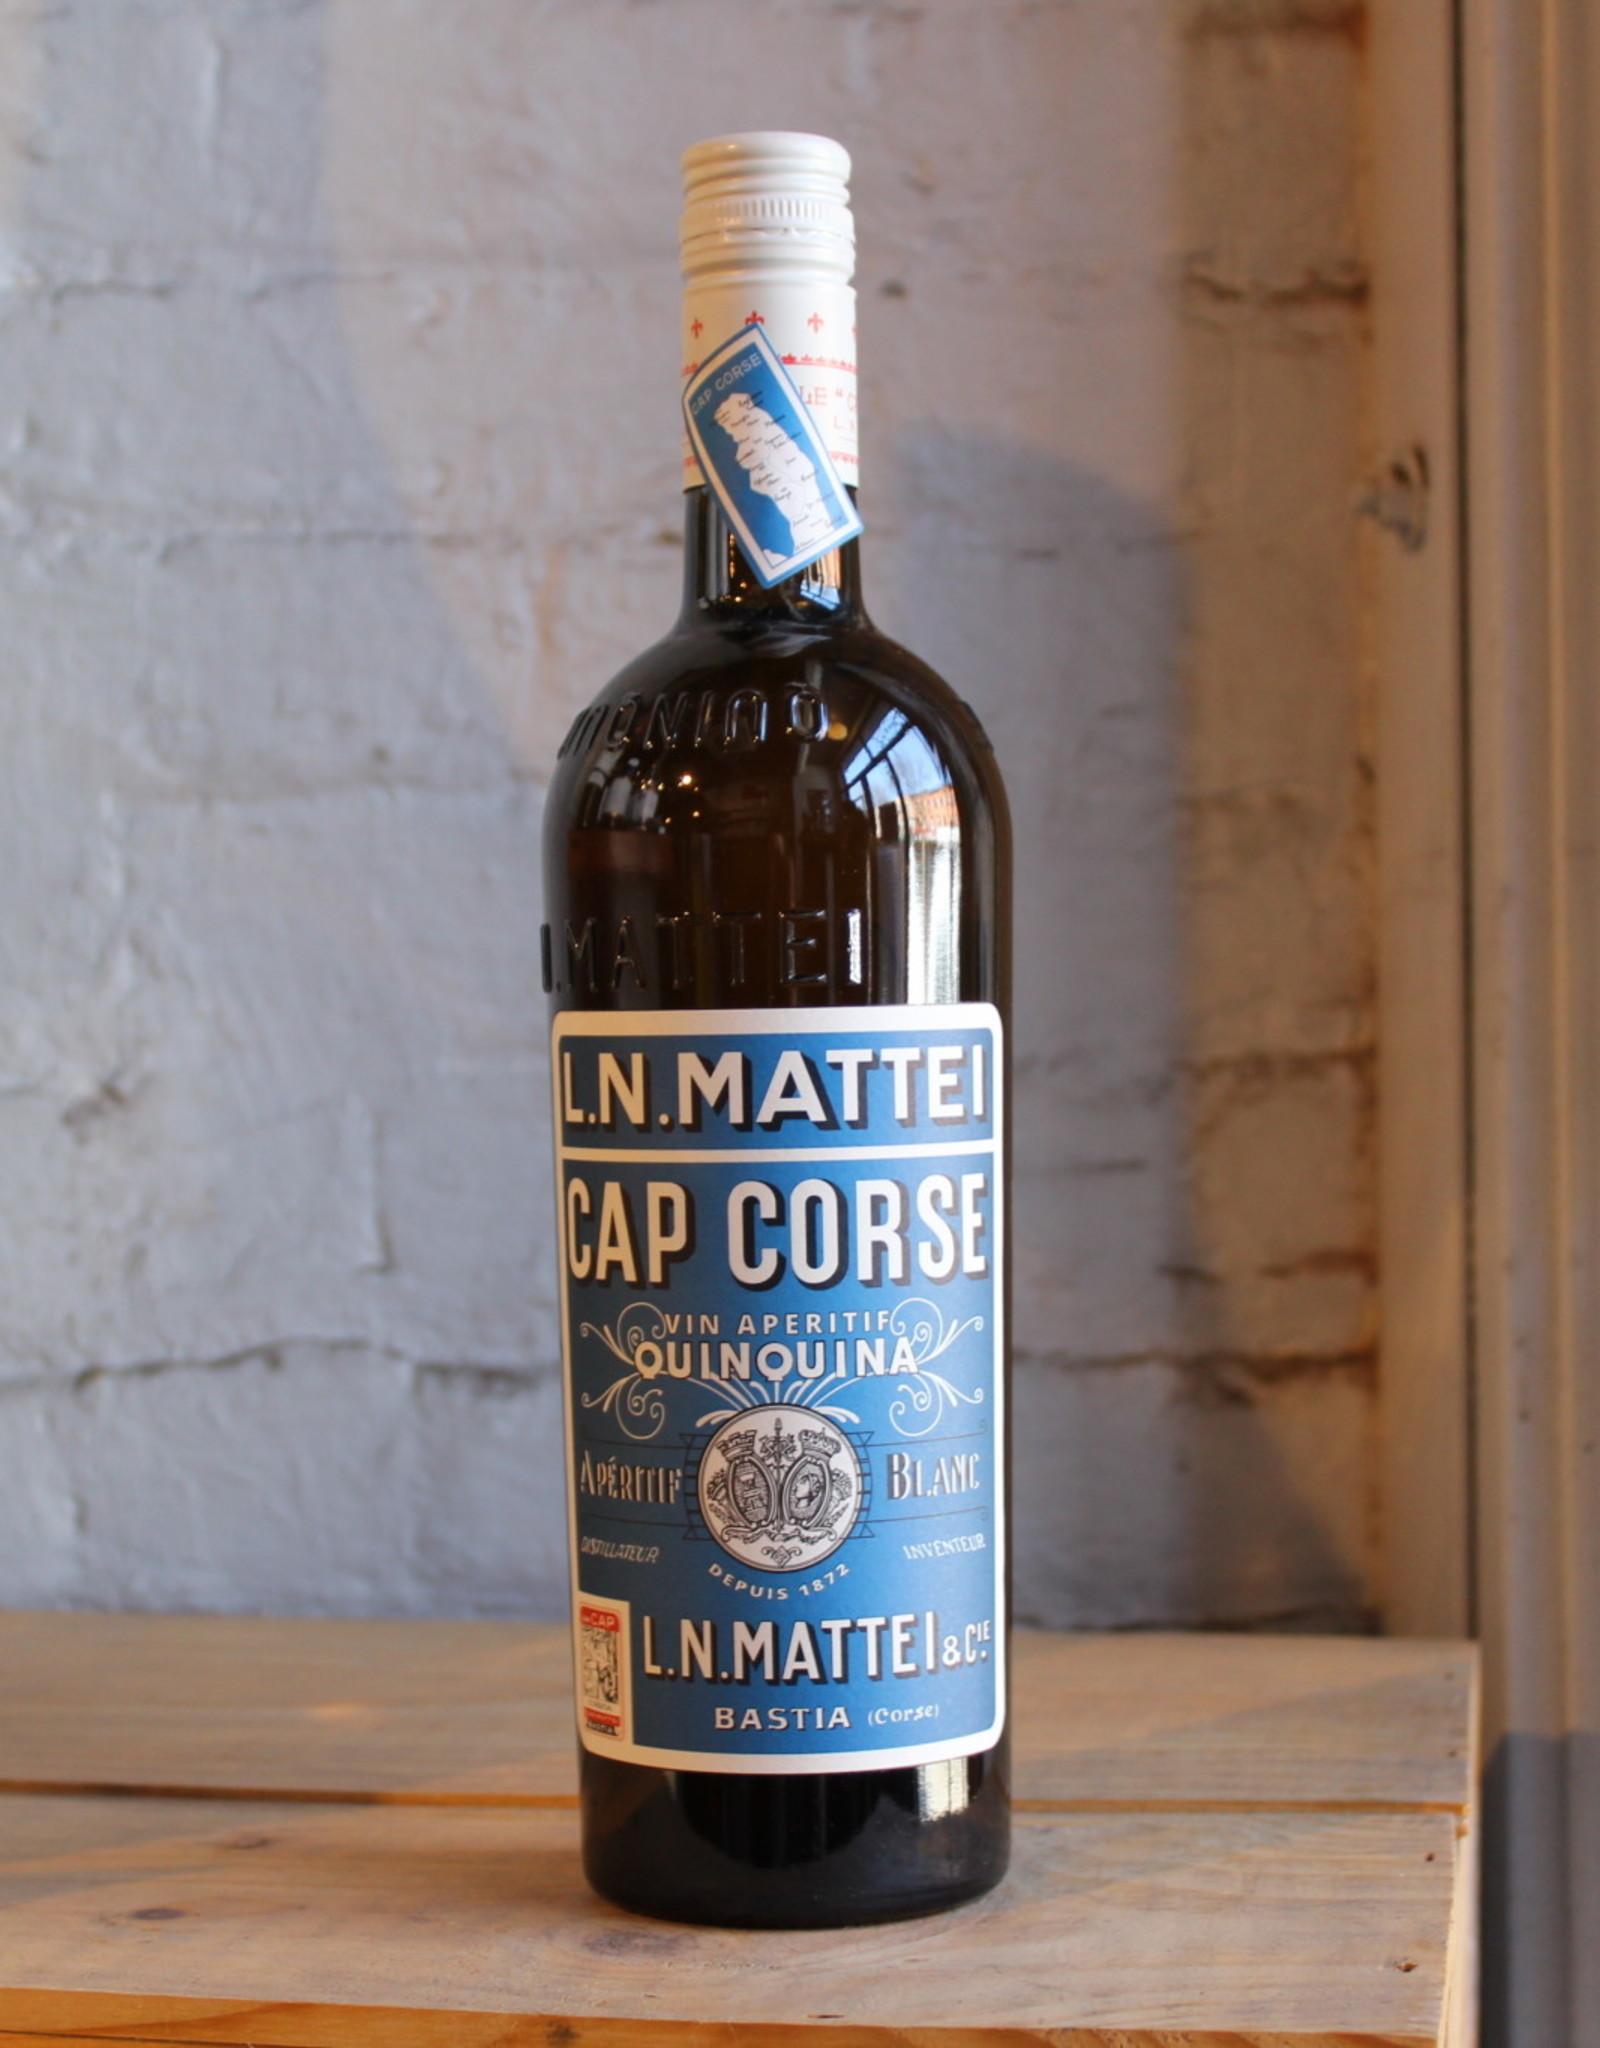 Cap Corse Mattei Quinquina Blanc Aperitif - Corsica, France (750ml)